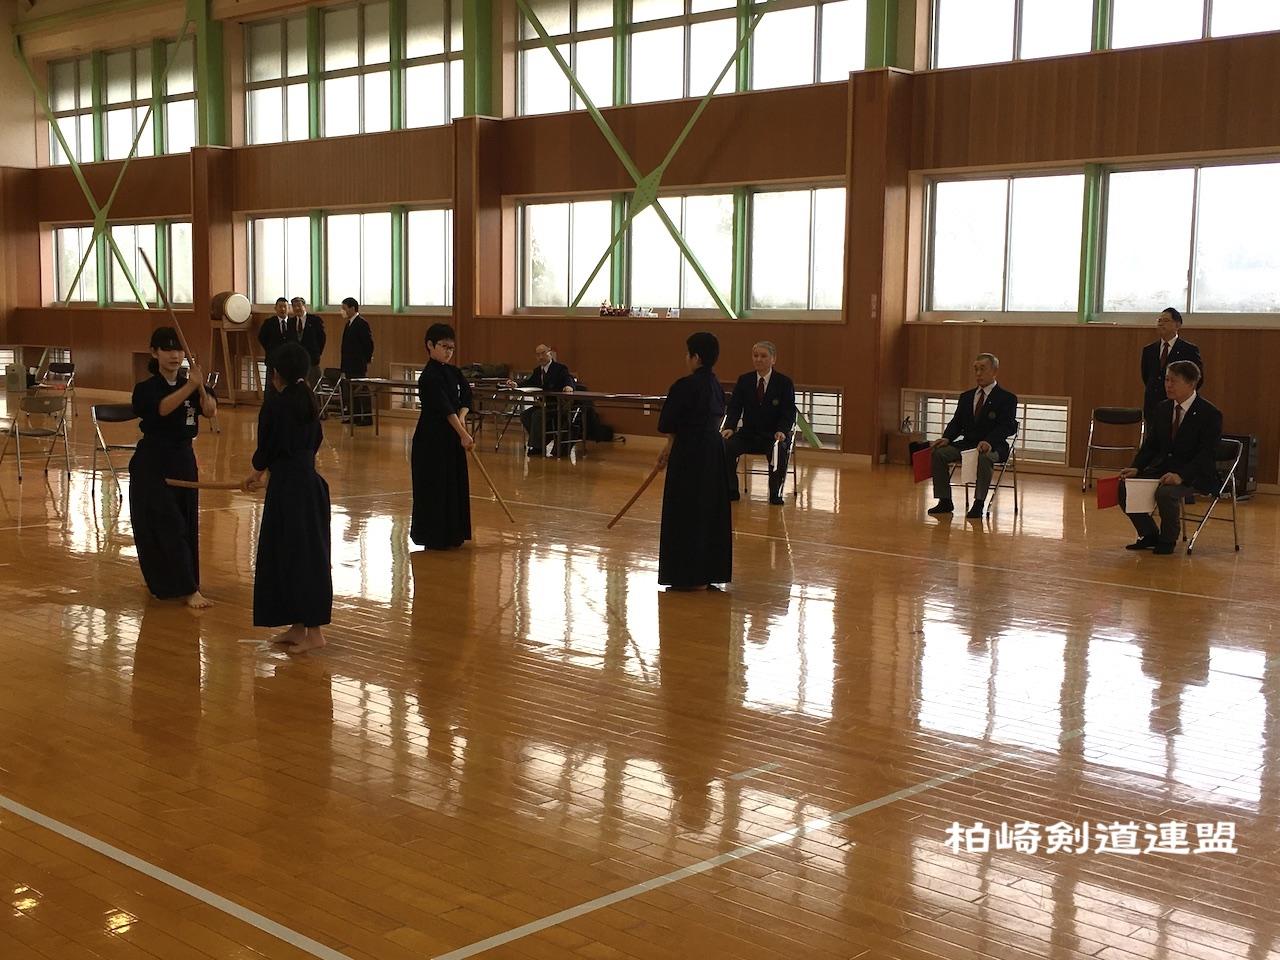 剣道 形 日本